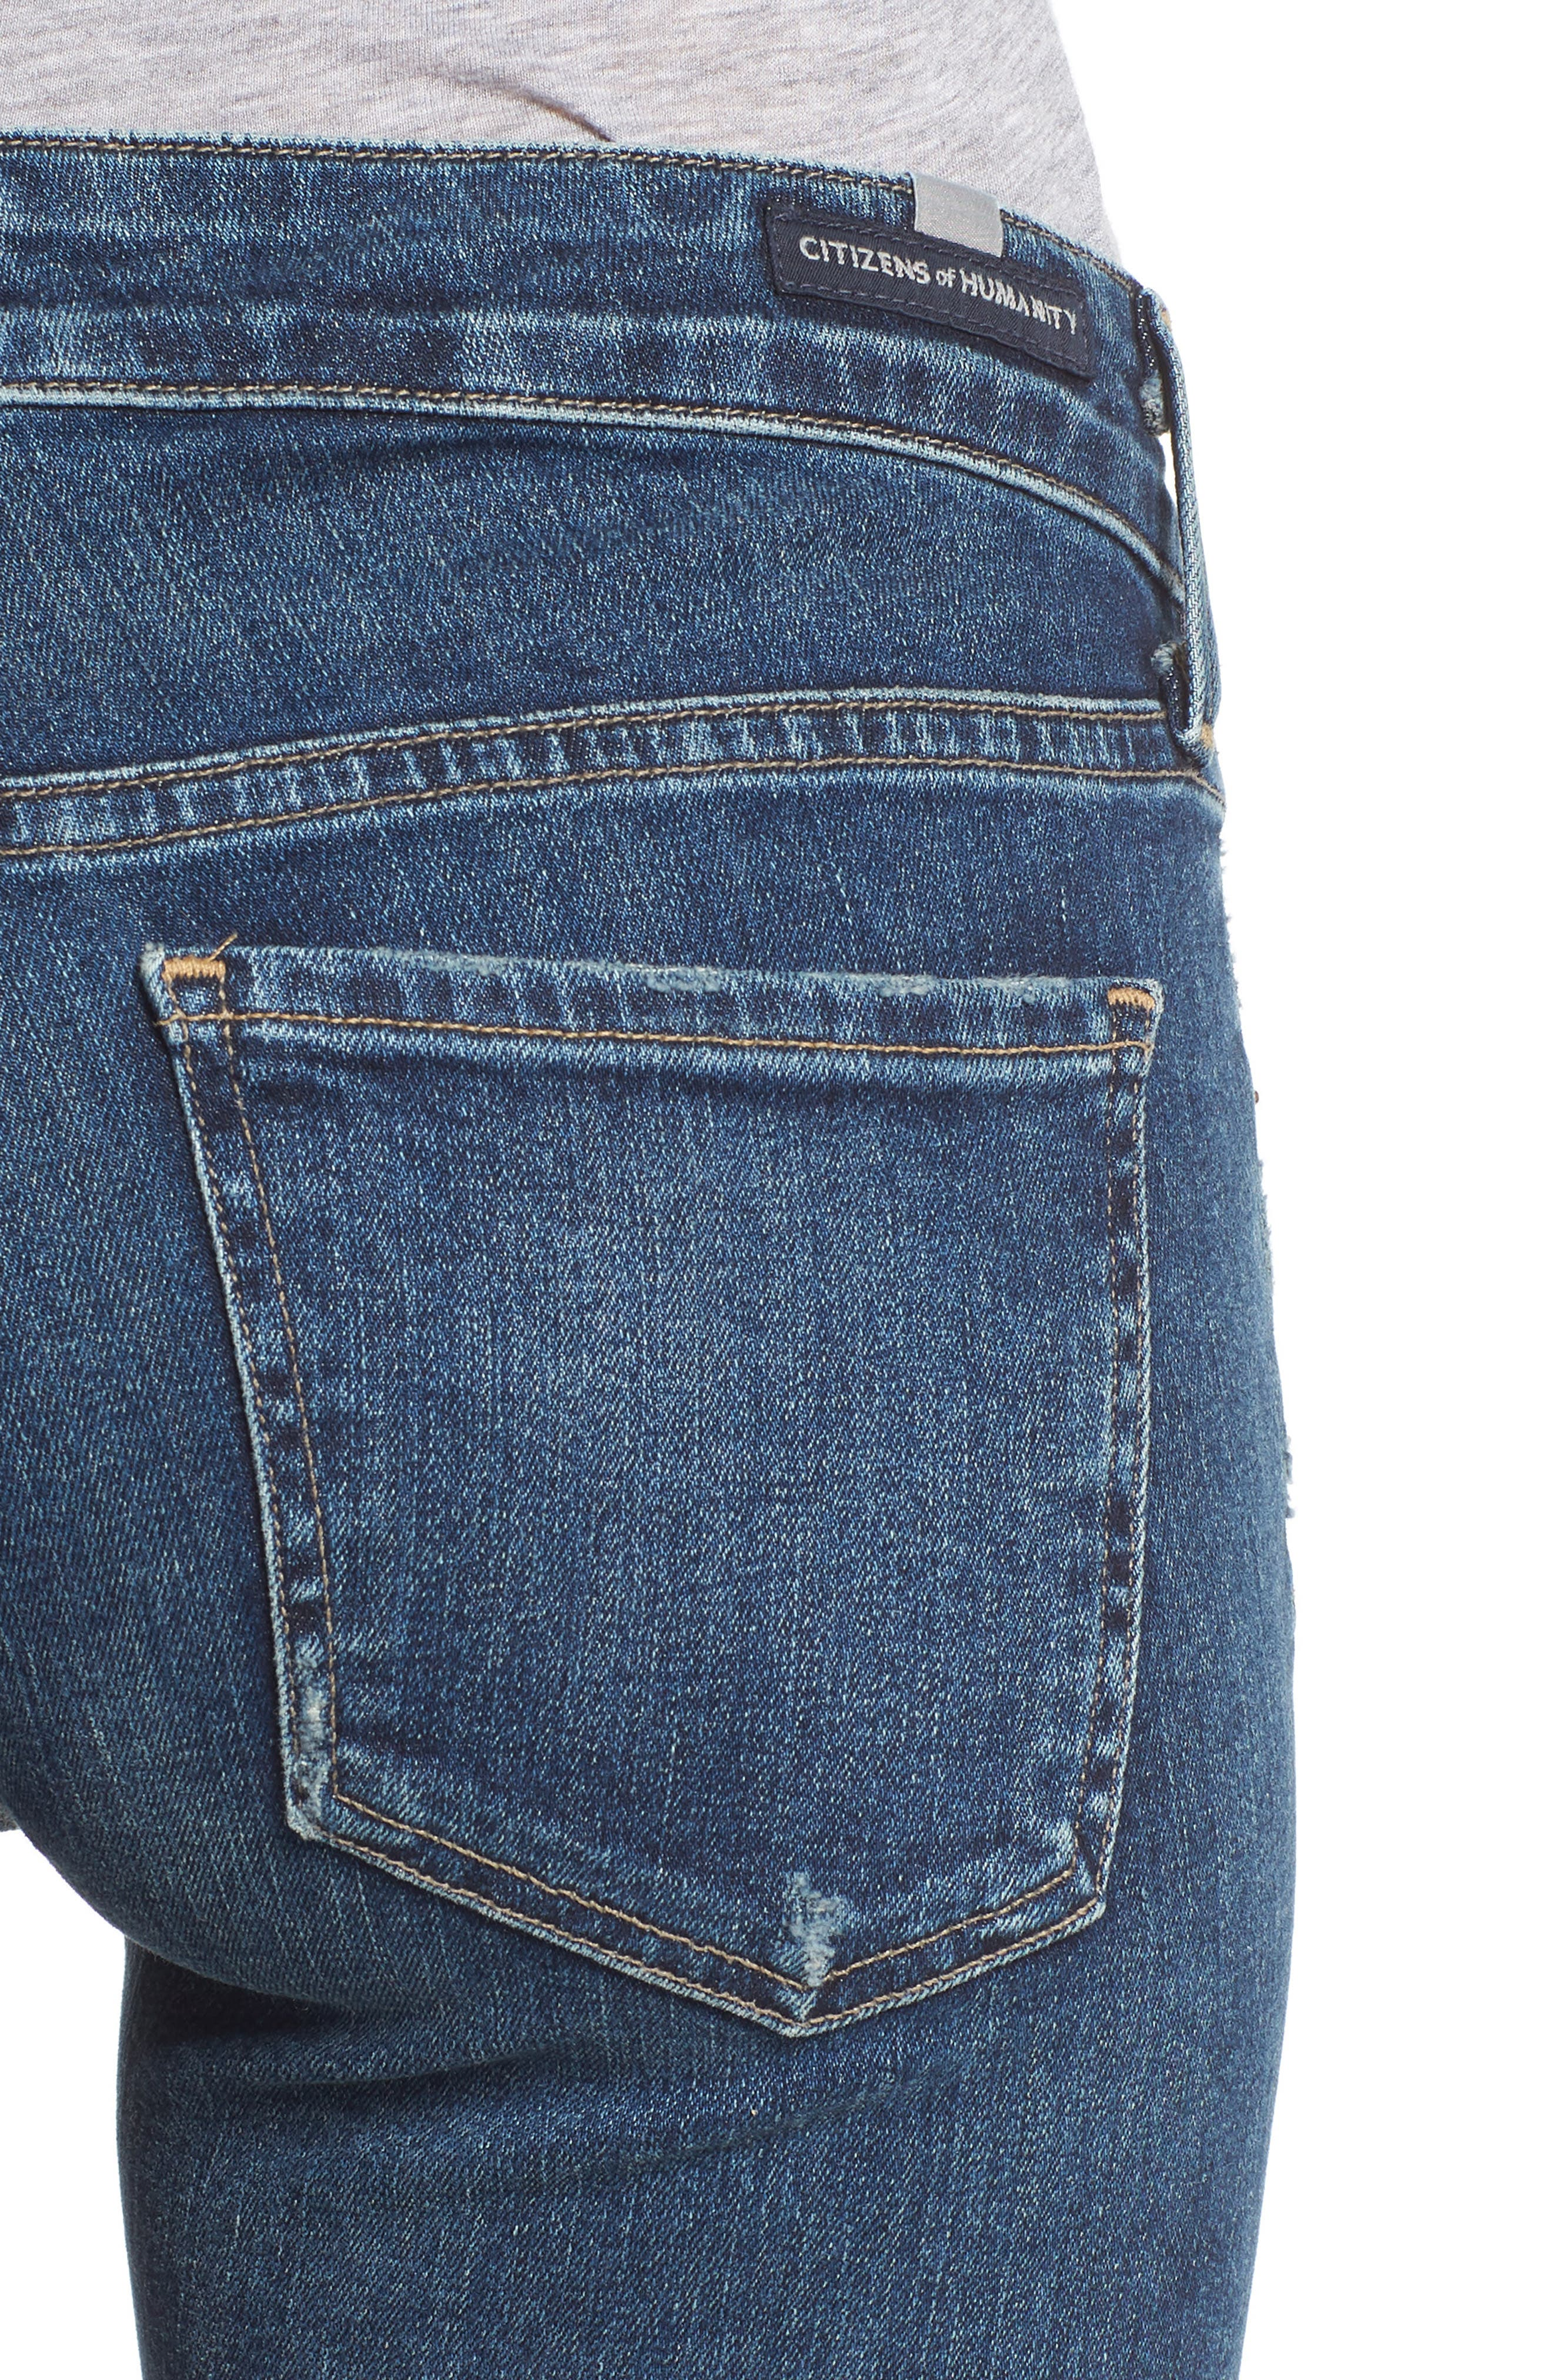 CITIZENS OF HUMANITY,                             Racer Slim Jeans,                             Alternate thumbnail 4, color,                             CASPIAN